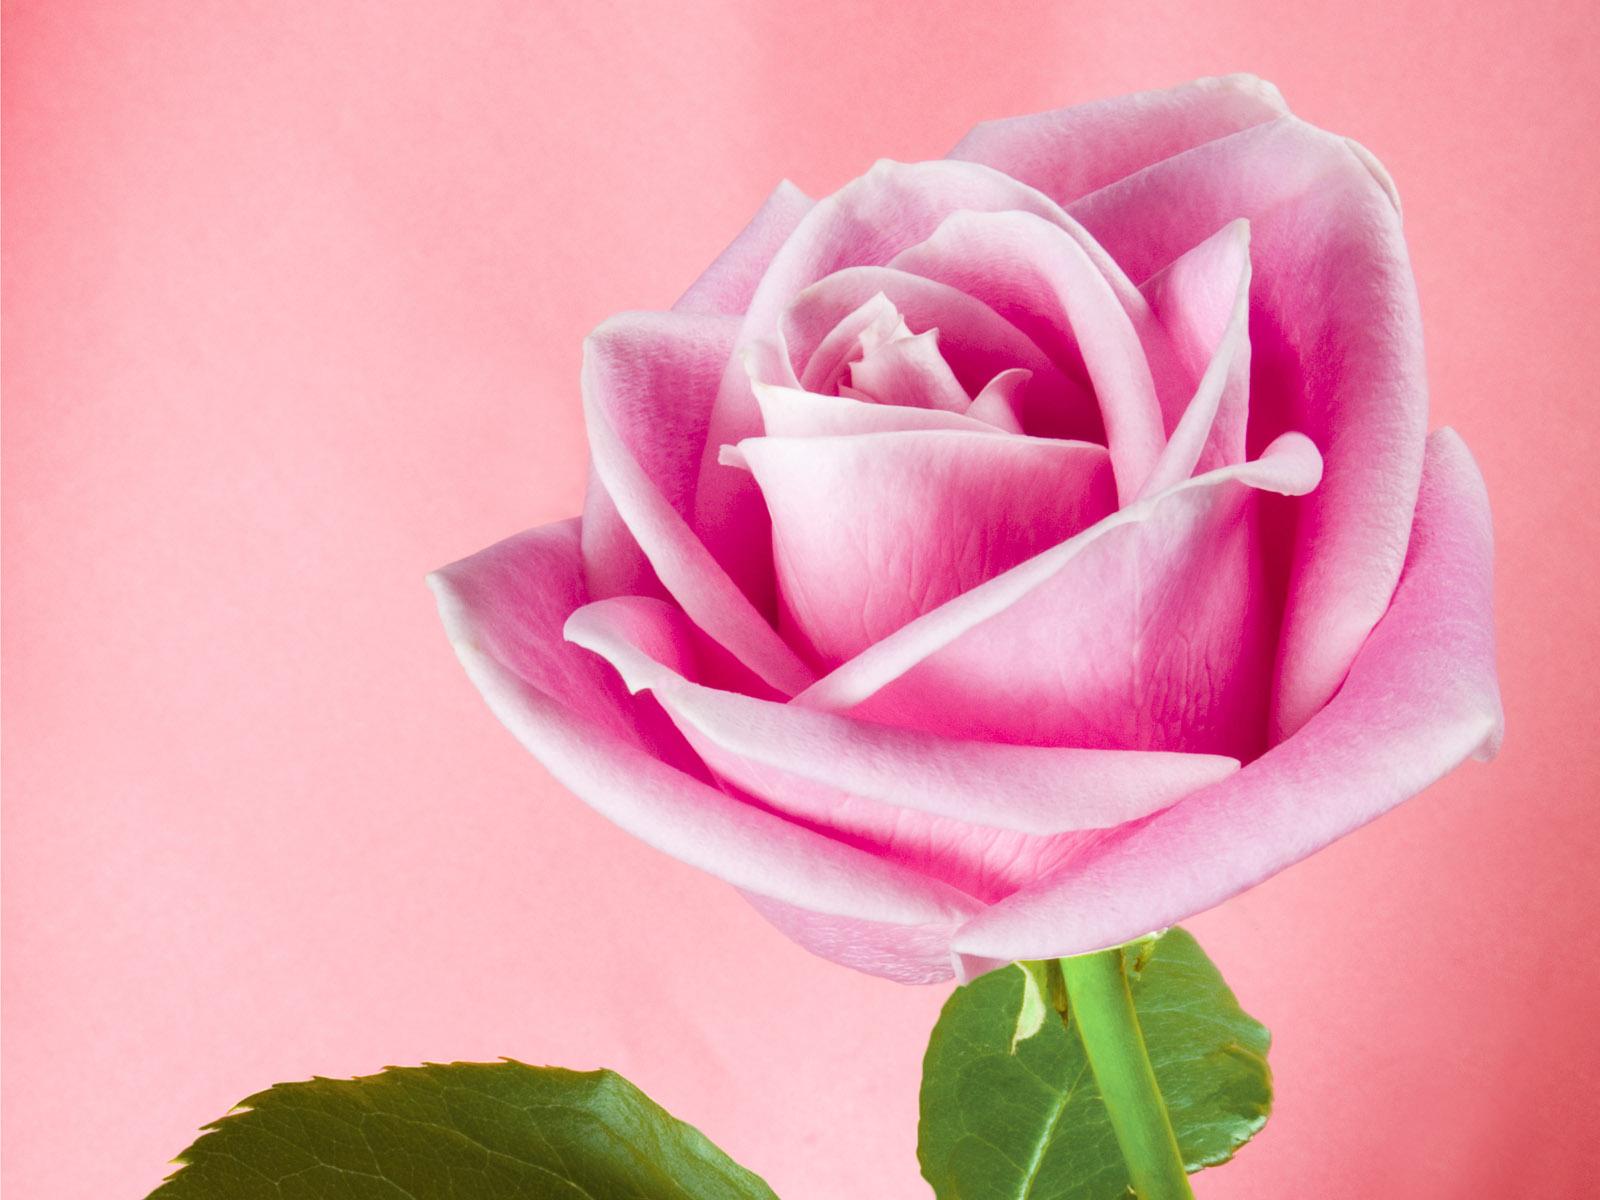 http://2.bp.blogspot.com/-wMTodjAJLu8/UJtsALg4vsI/AAAAAAAAB48/ZiT0aGNo5zo/s1600/Pink%2BRose%2B(1).jpg